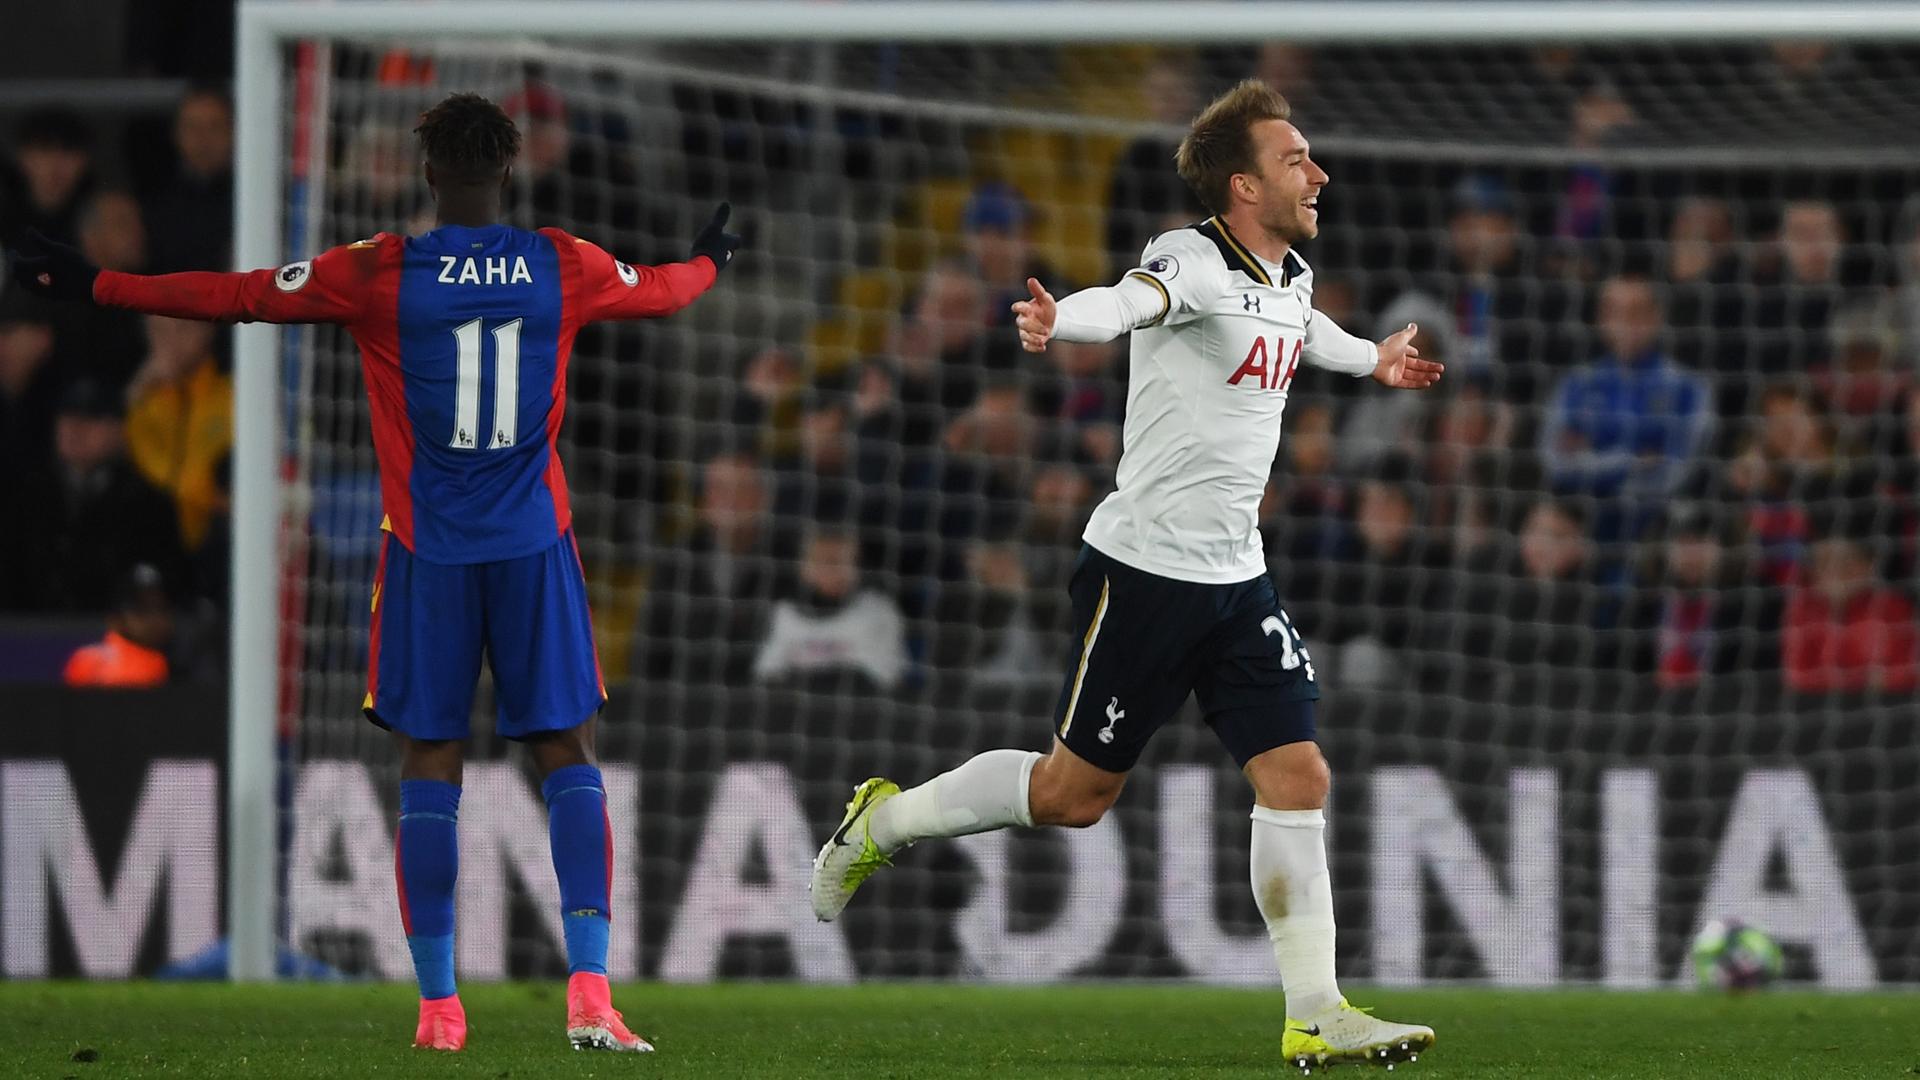 Tottenham 1-0 Crystal Palace: octavo triunfo consecutivo de los